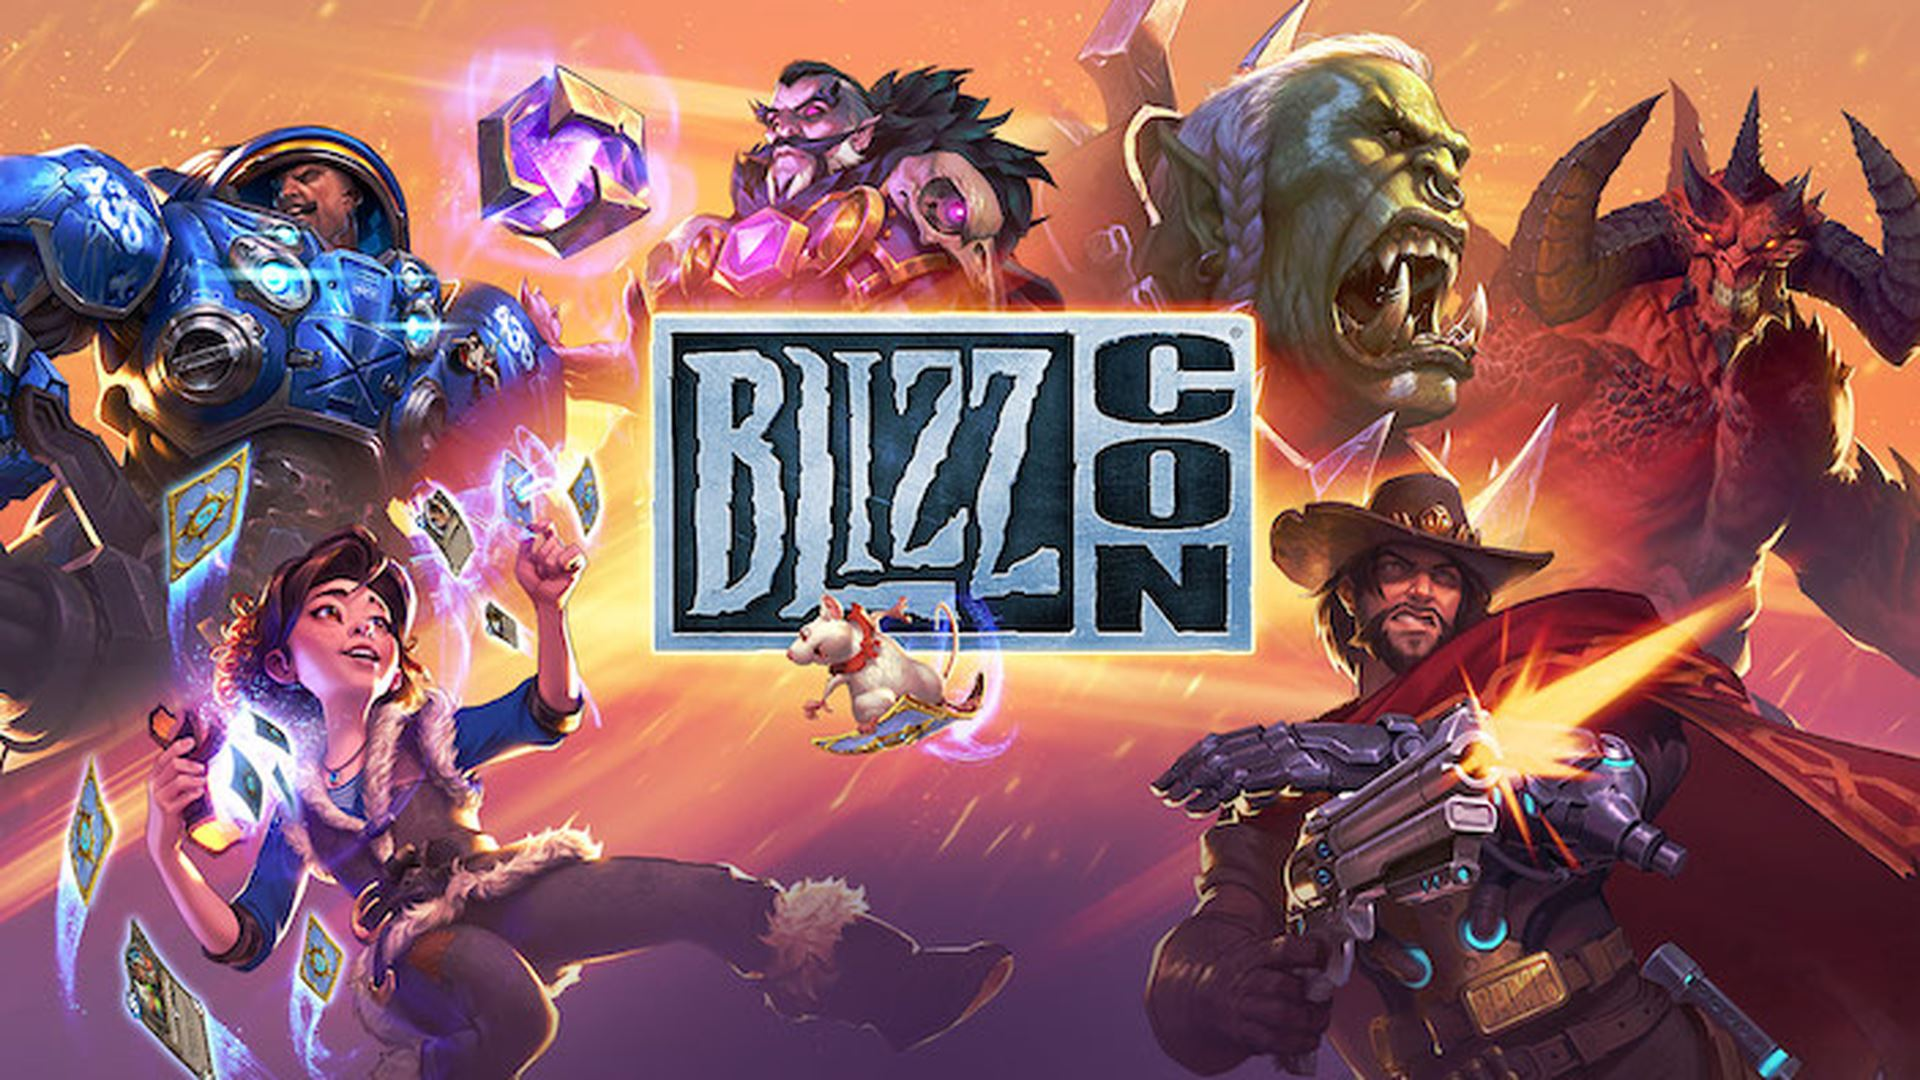 Blizzard BlizzCon 2020